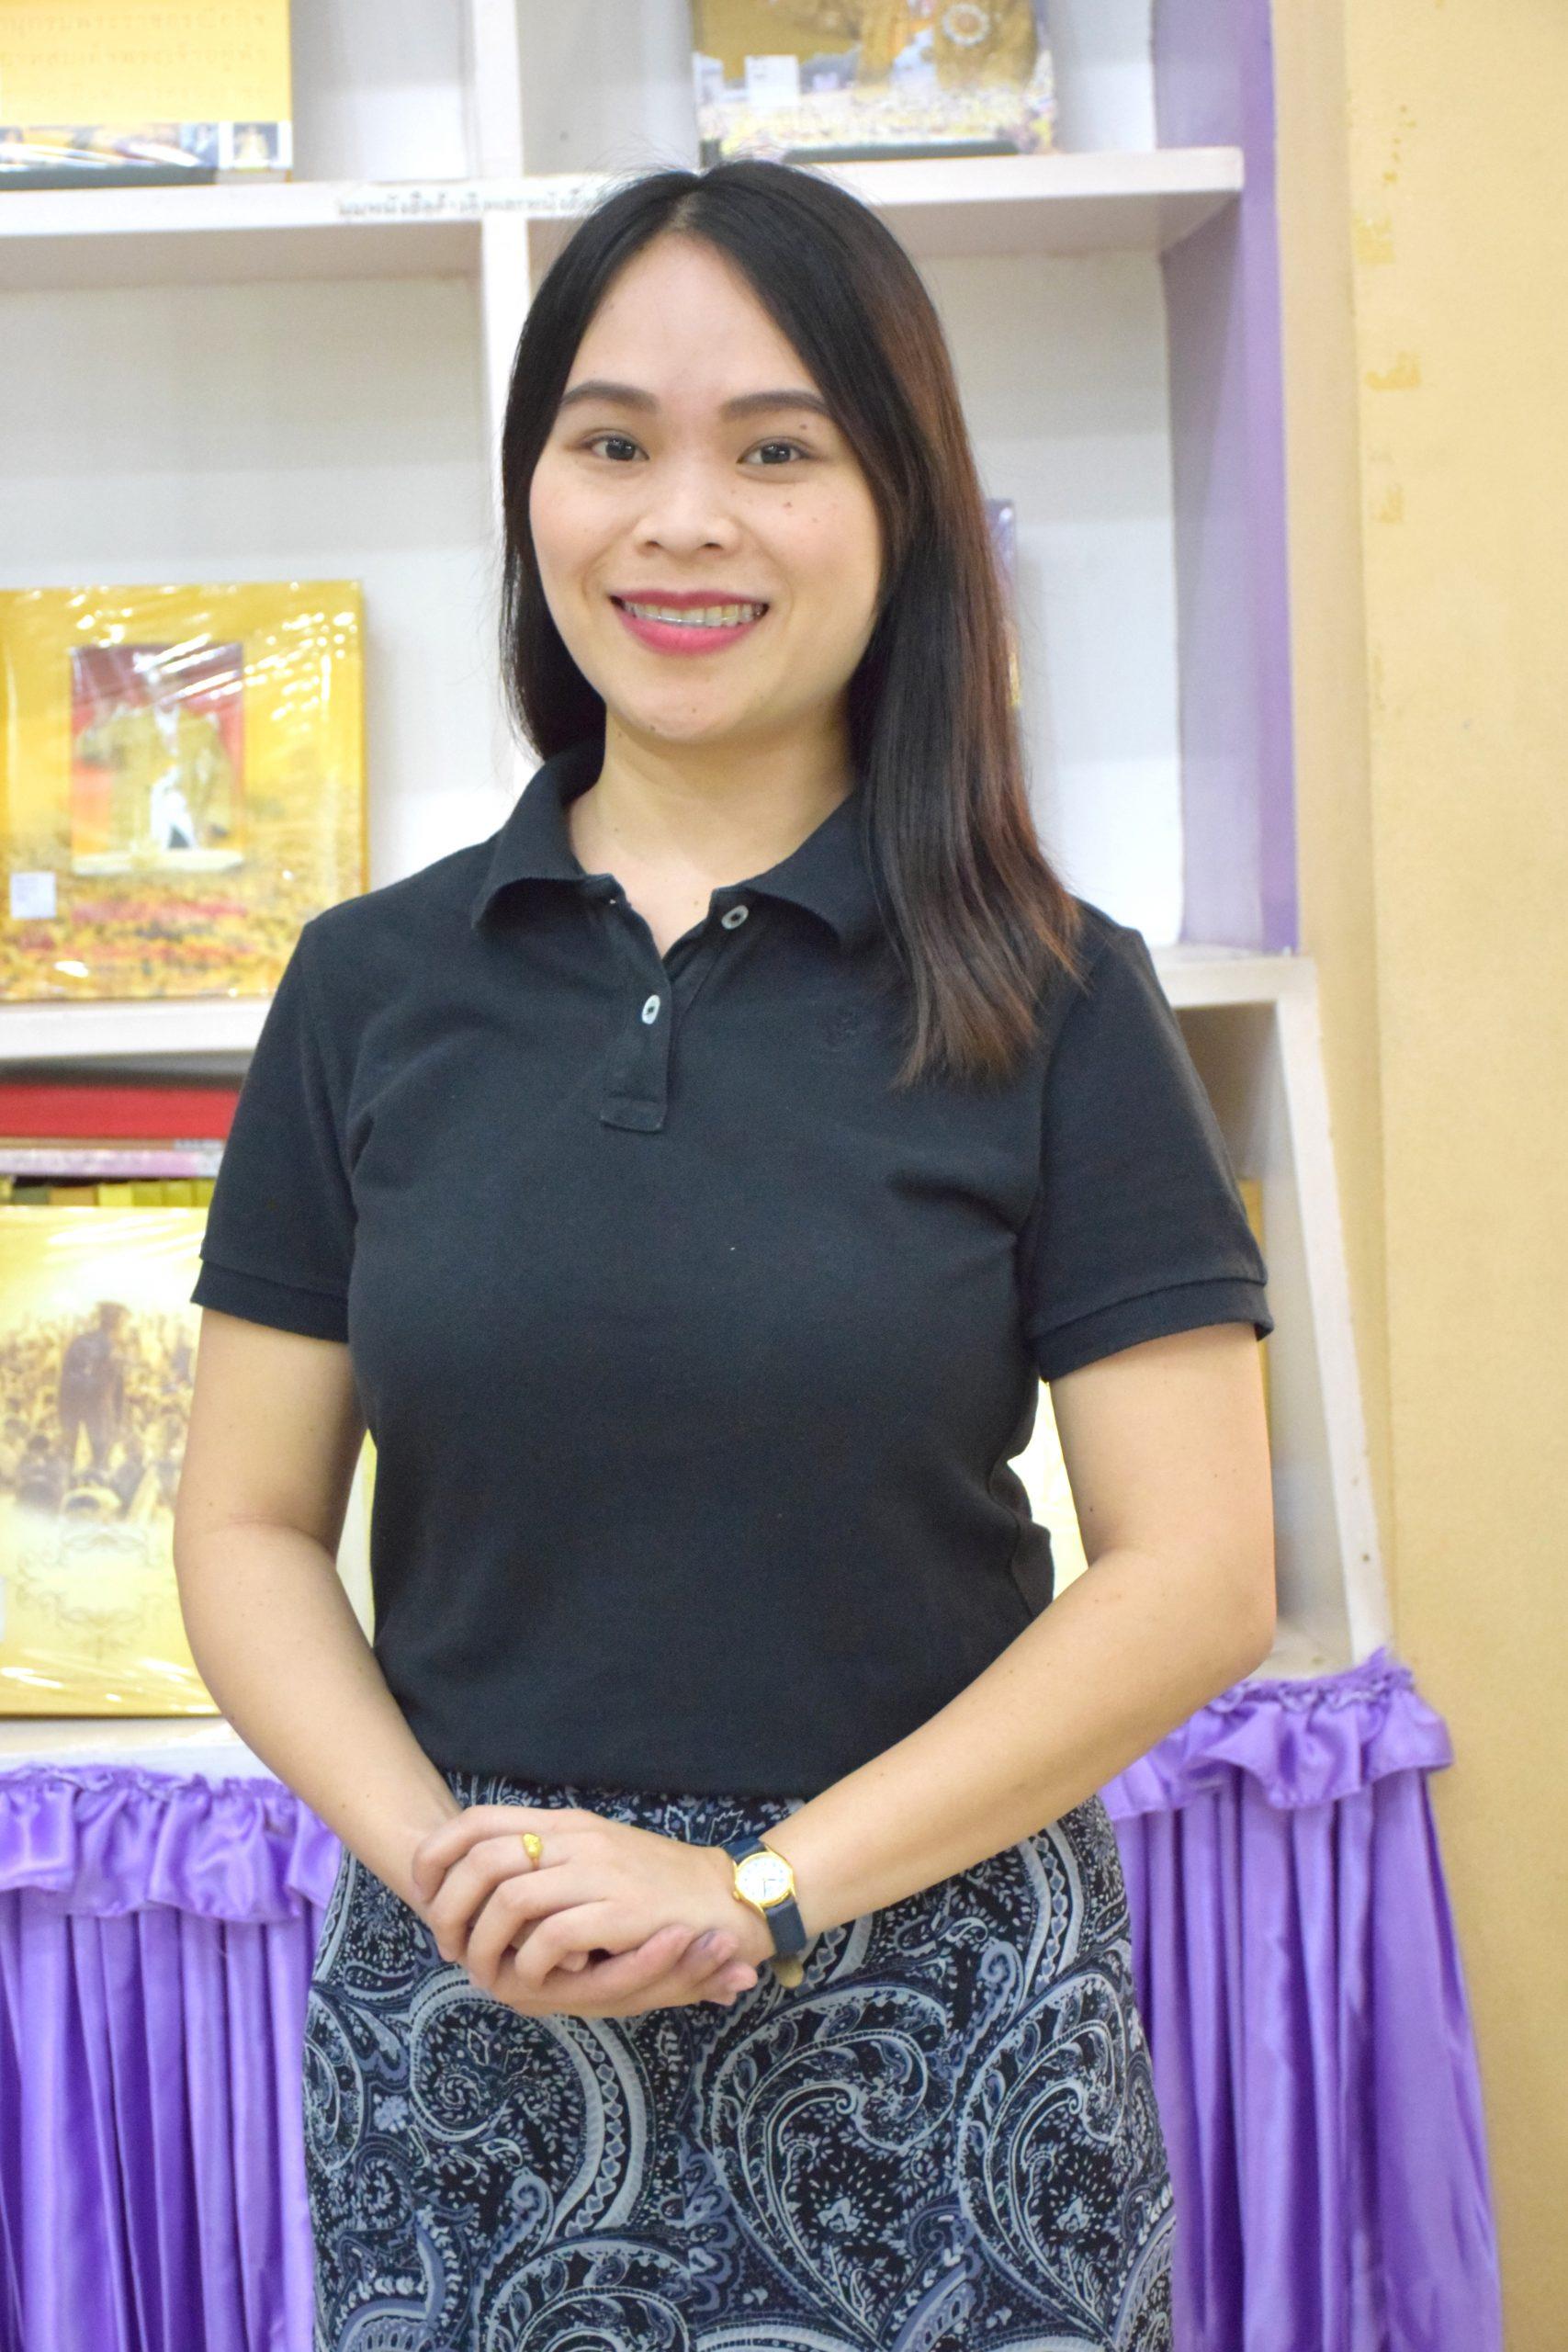 Miss Jonalyn Ragas Atondag